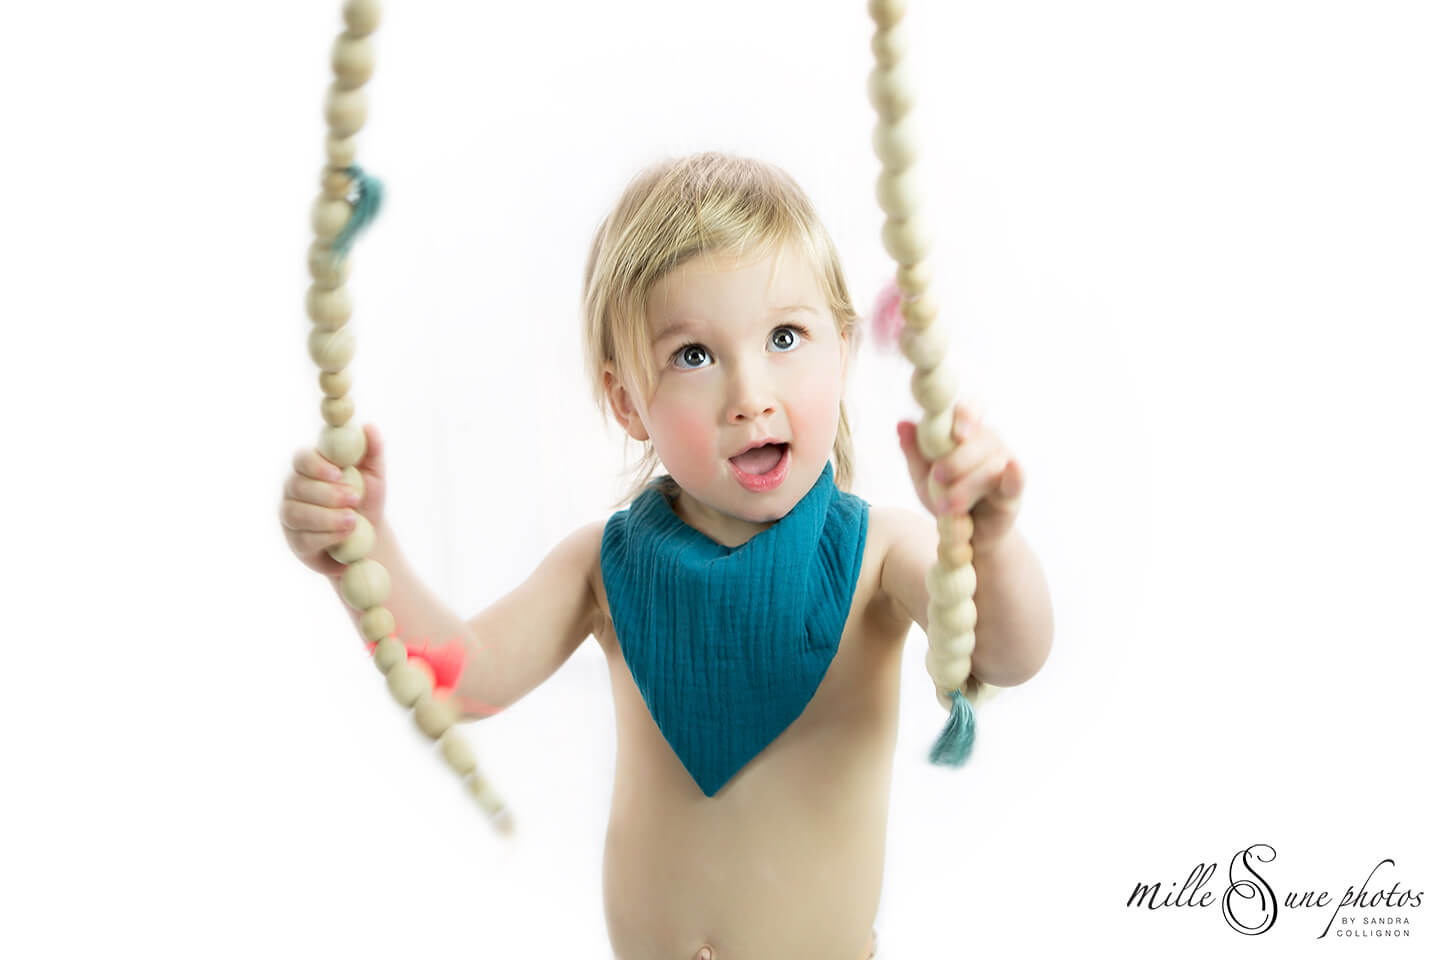 Enfant 1001photos moselle 18 jpg